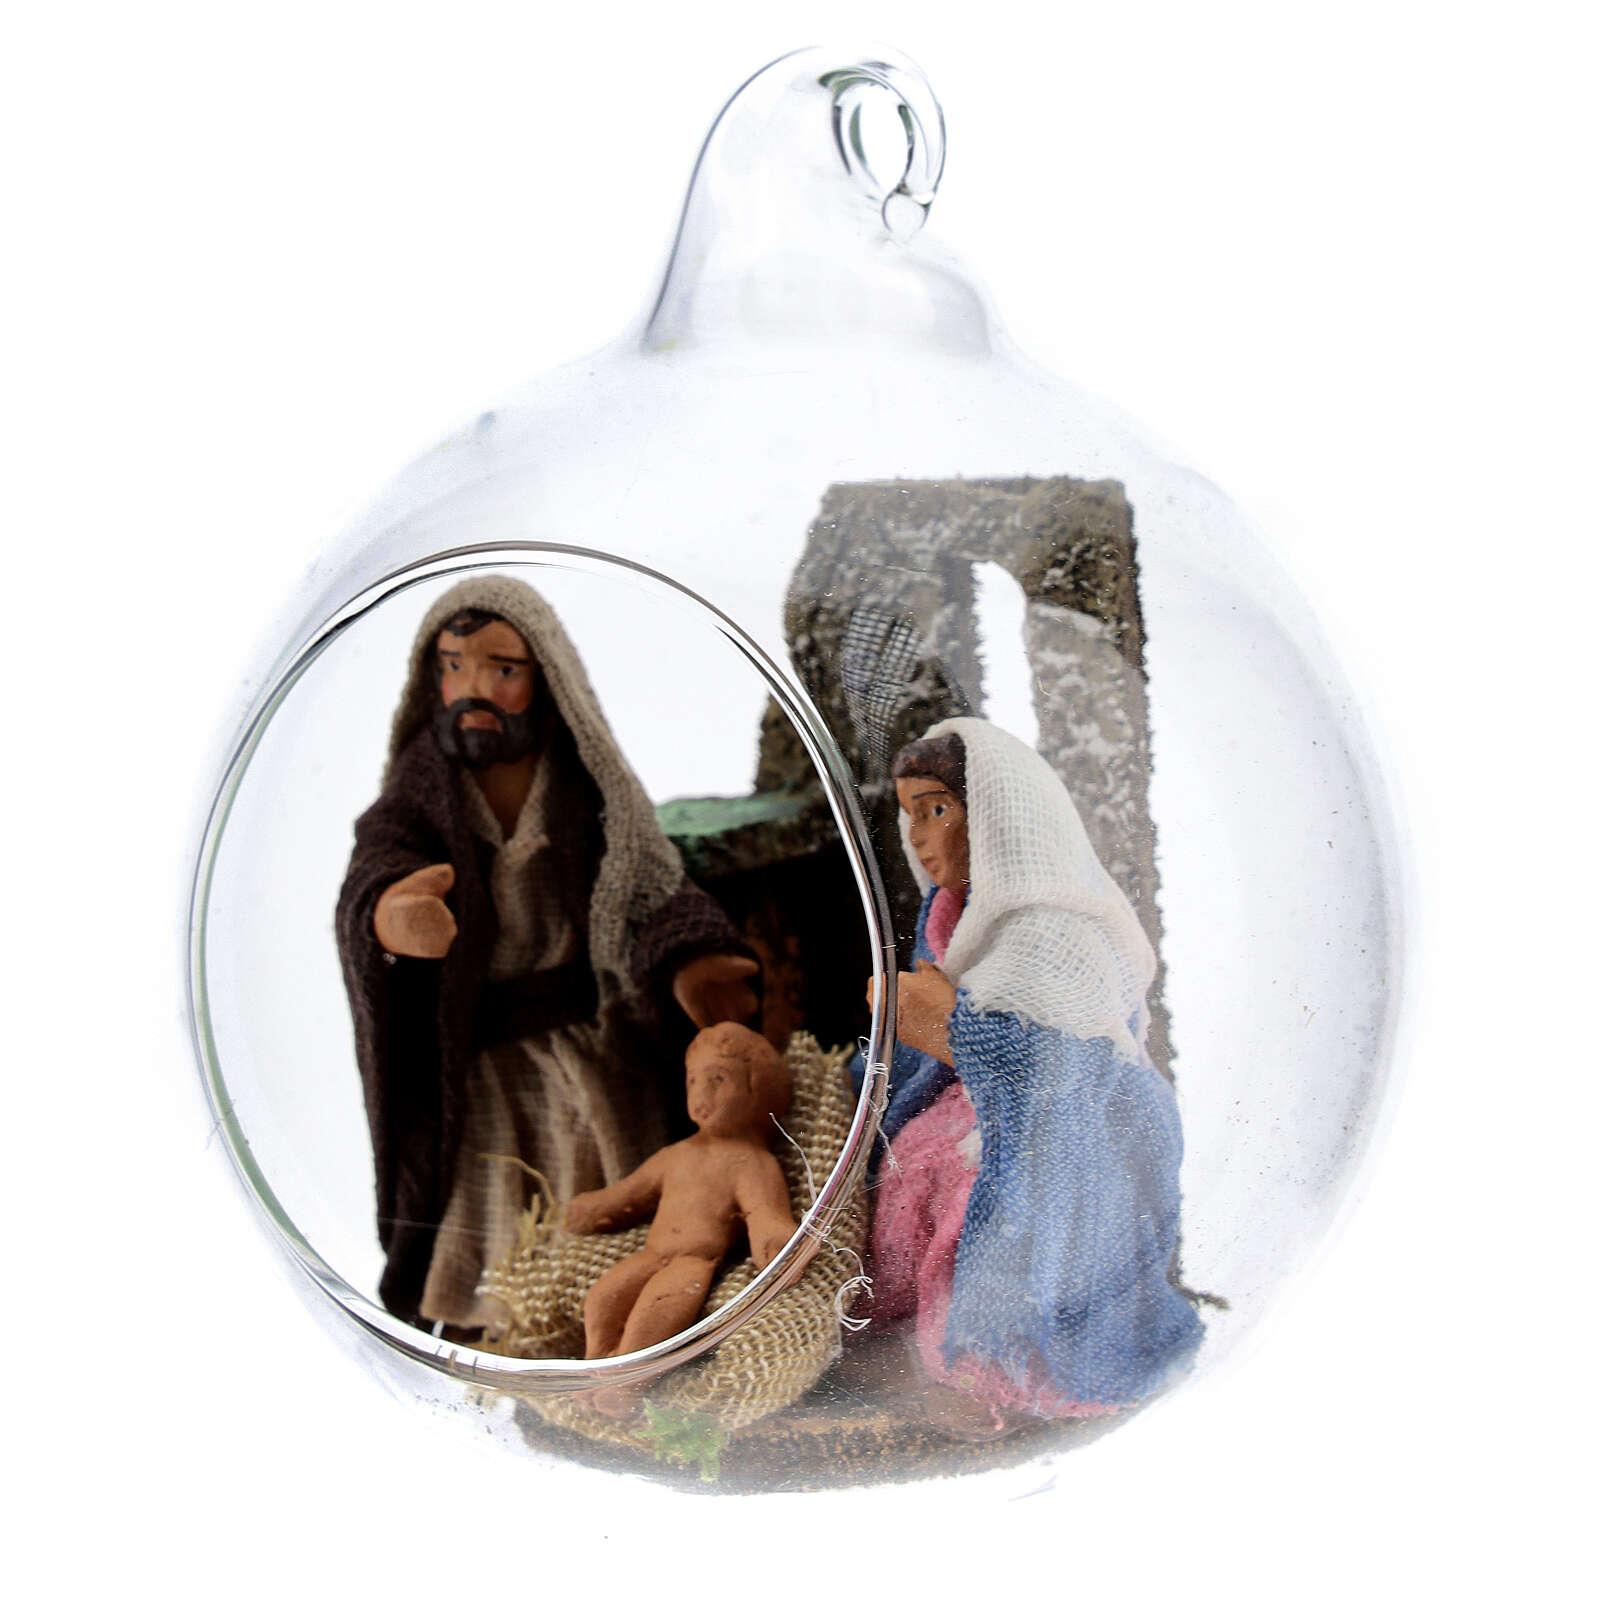 Glass ball with Holy Family figurines, 7 cm diam Neapolitan Nativity 4